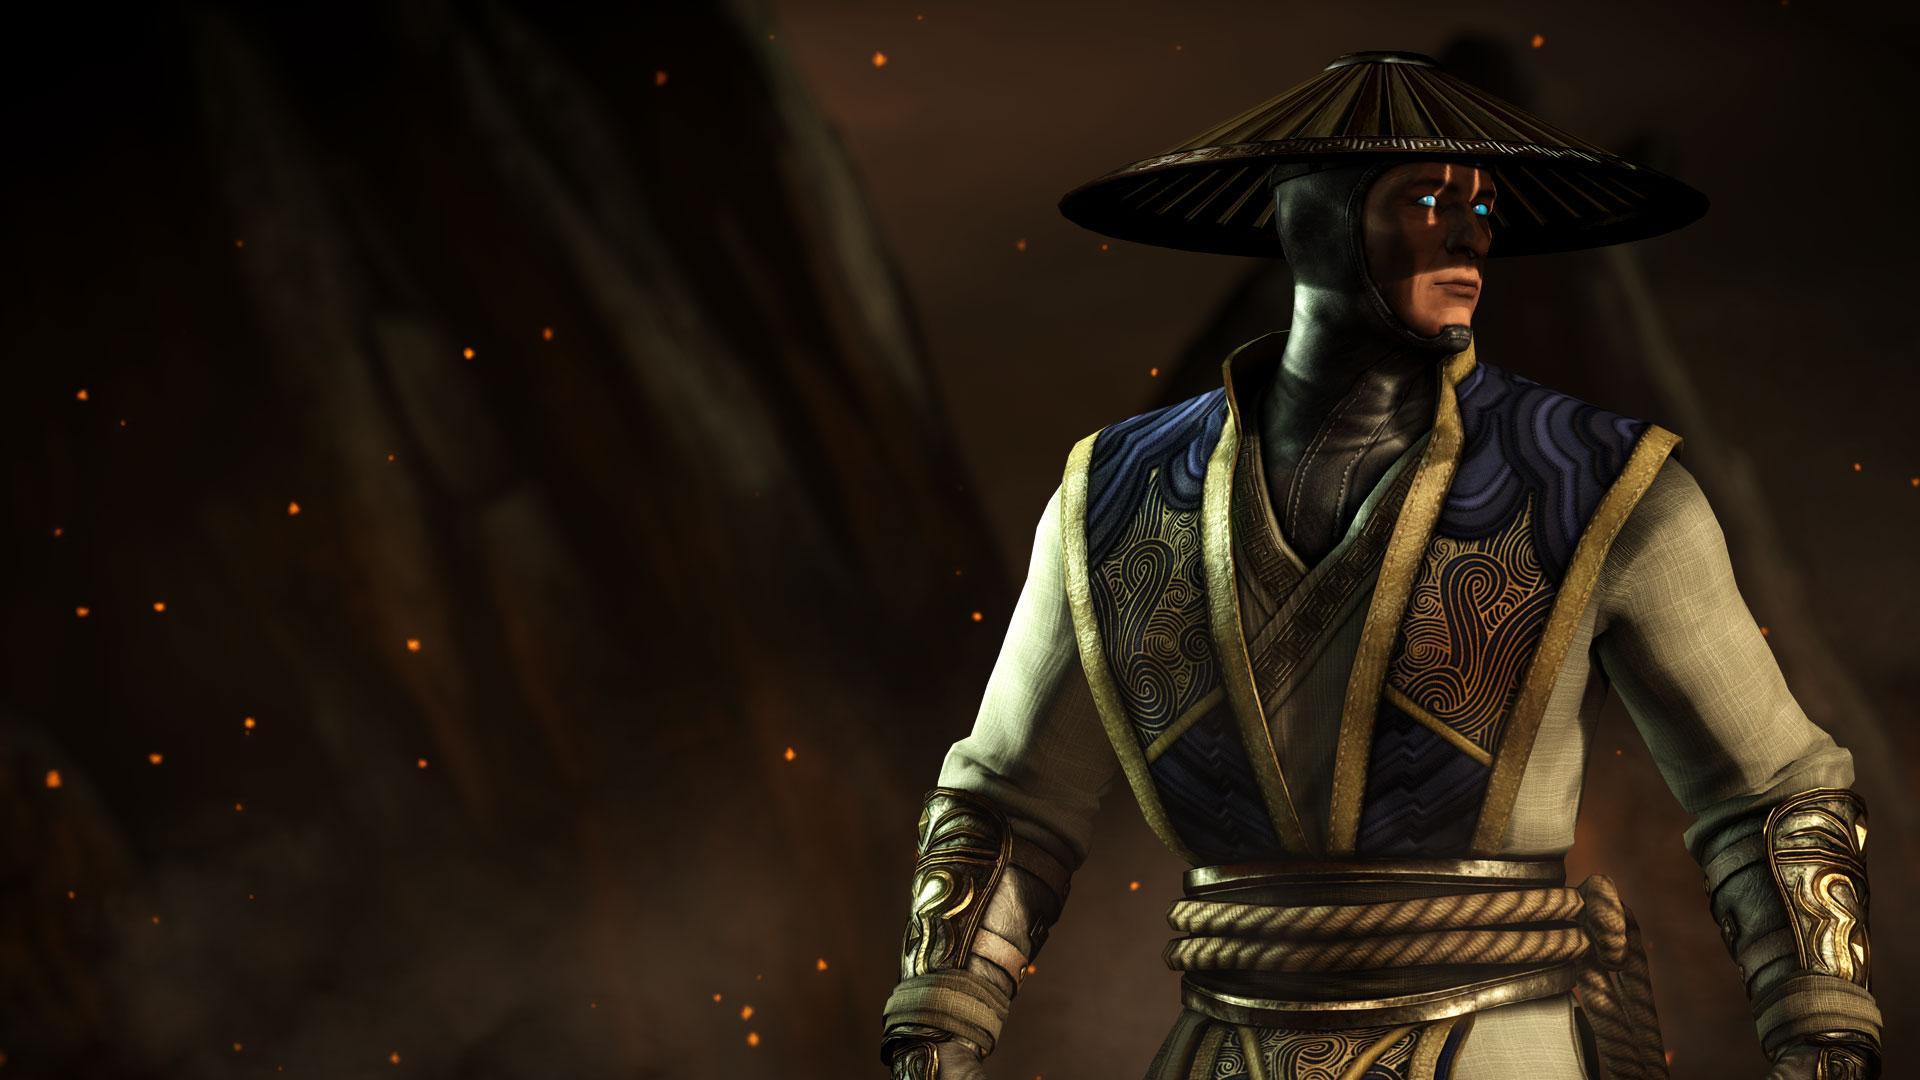 Amazon com: Mortal Kombat X: Kollector's Edition - Xbox One